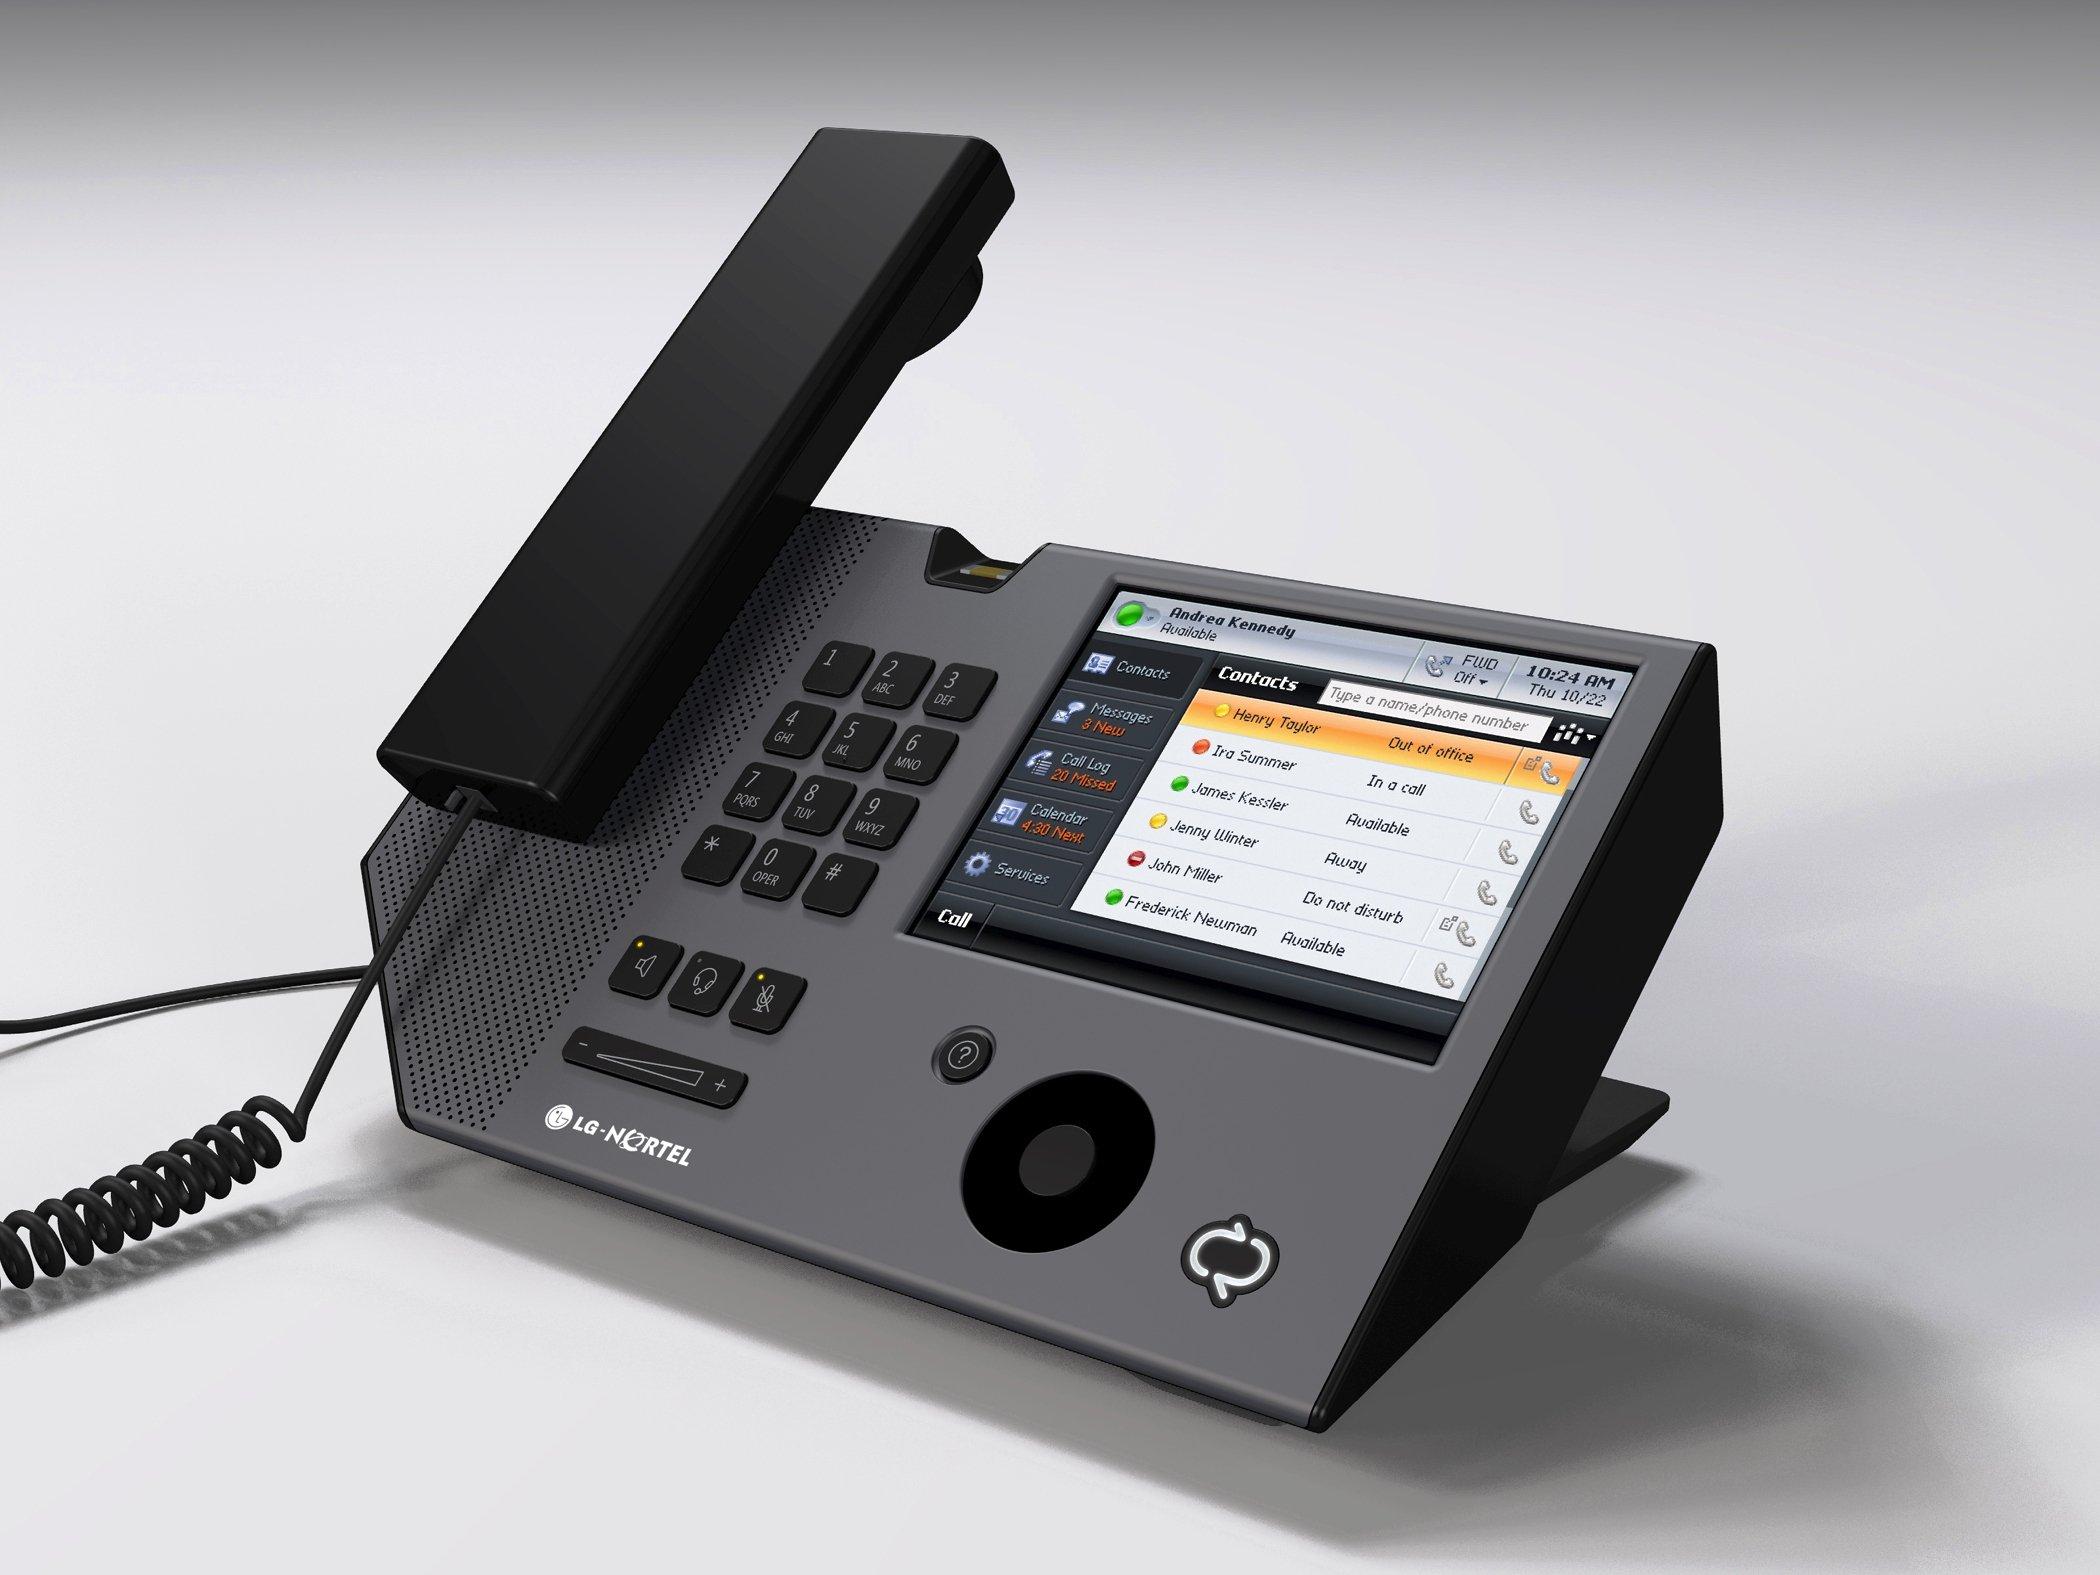 Nortel Lg Ip Phone 8540 Phone 8540 for Microsoft Ocs